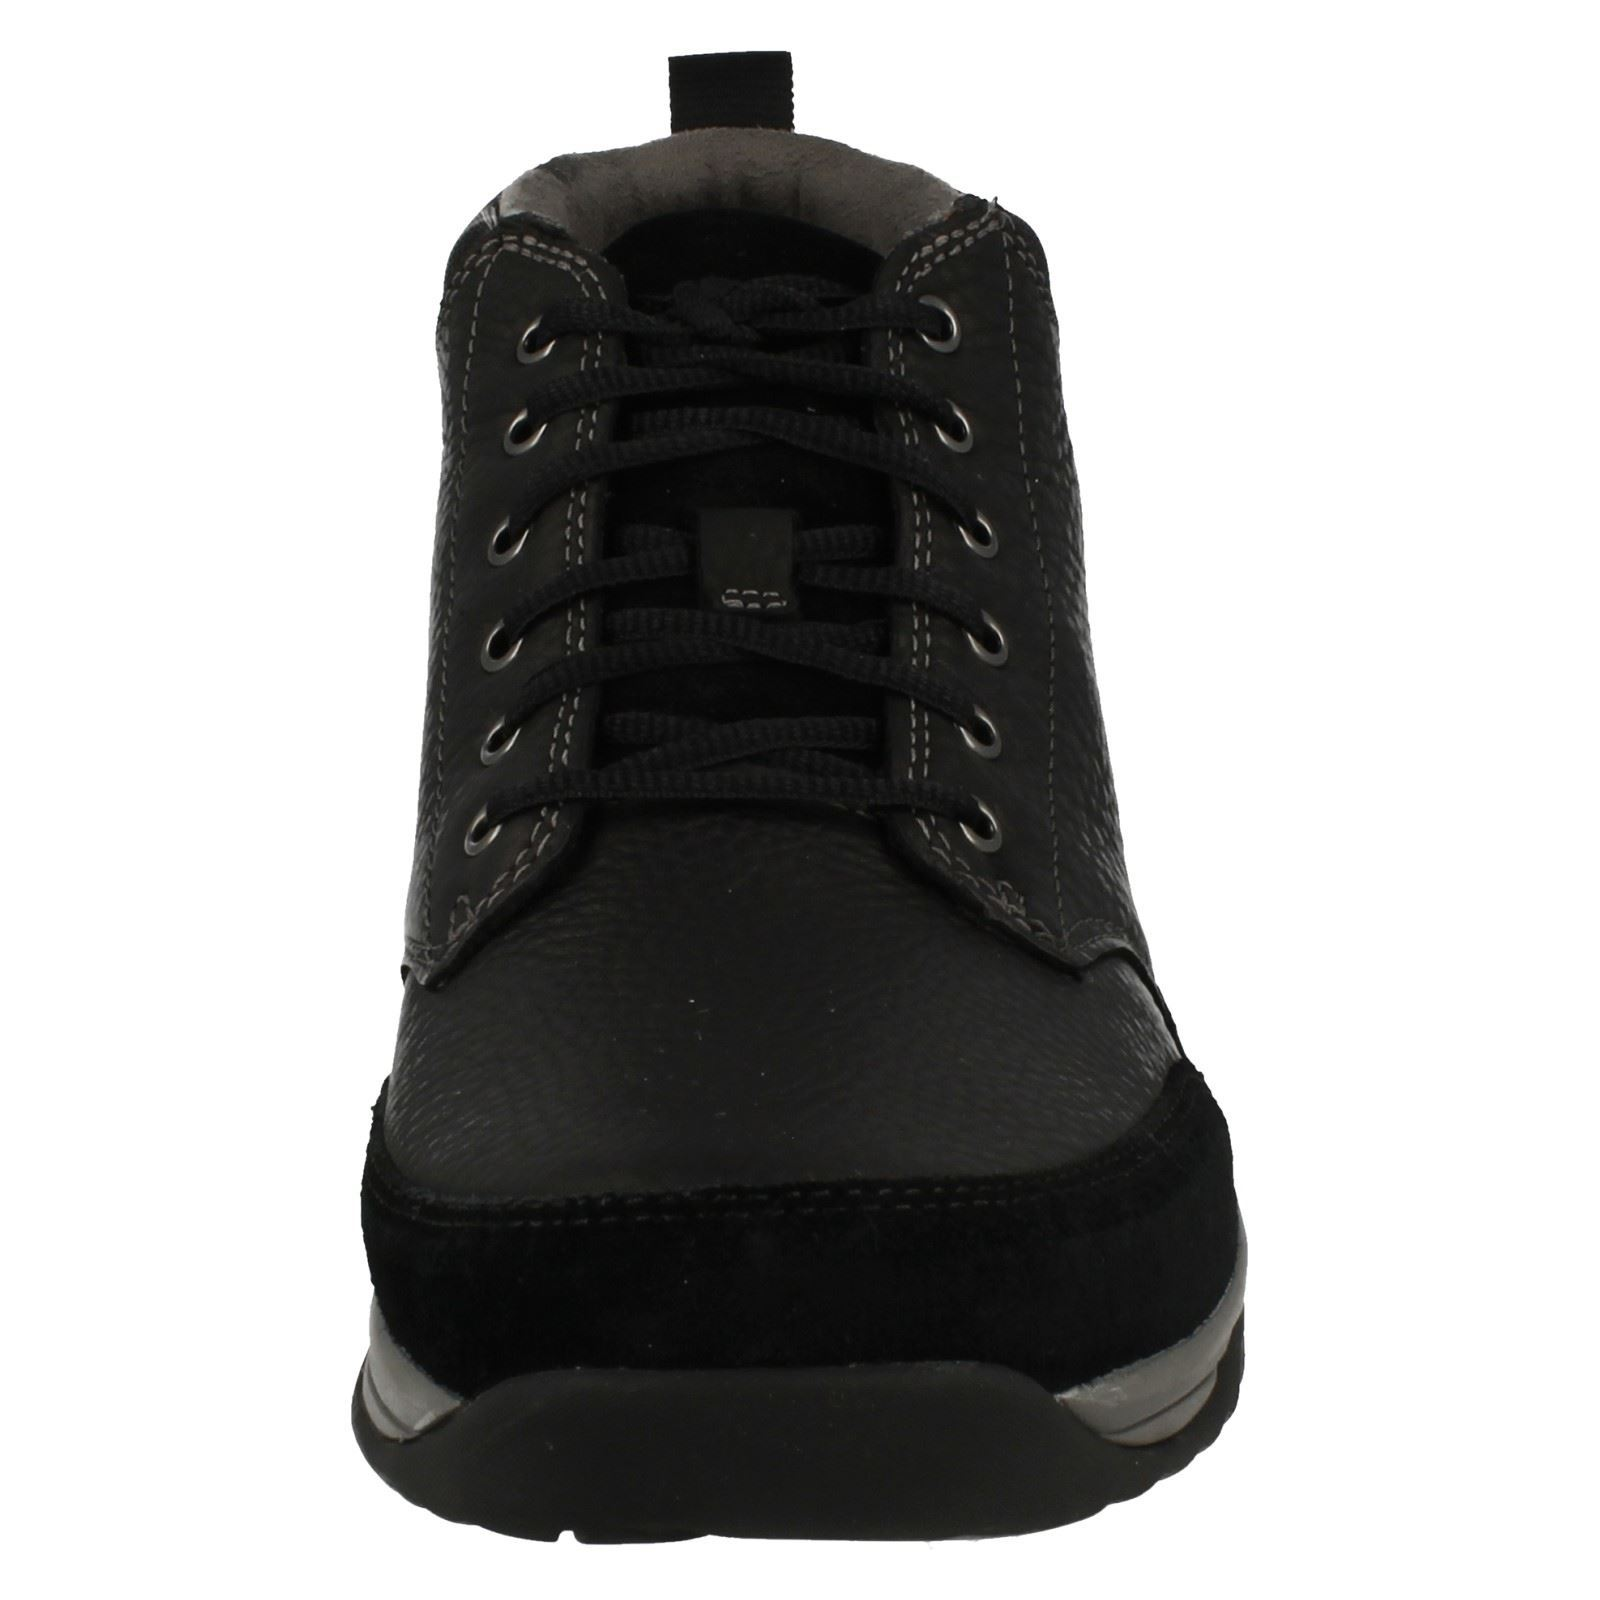 Mens Clarks Goretex Baystone Leather Waterproof Lace Up Boots - Baystone Goretex Top GTX 897cfa